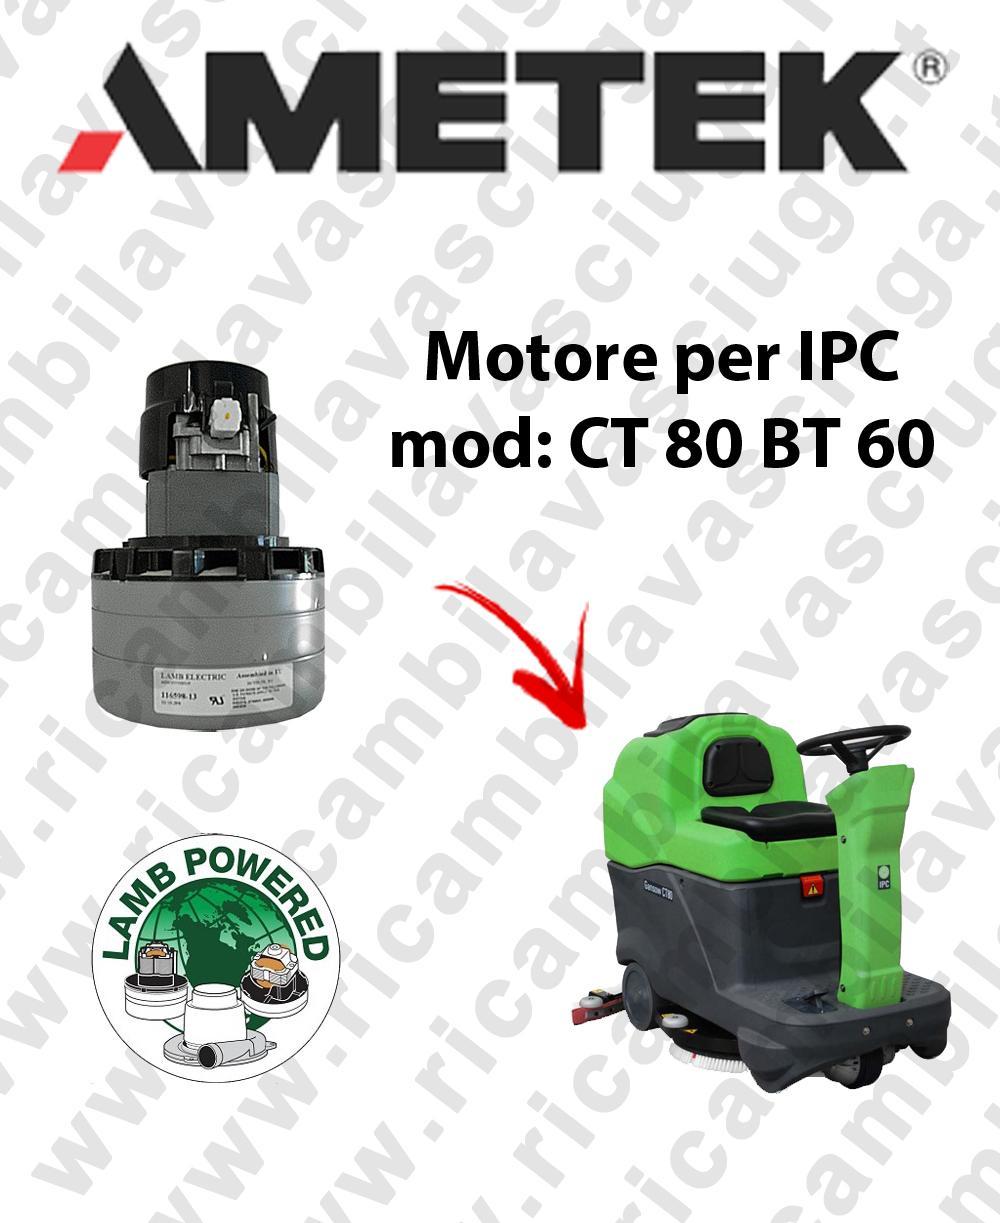 CT 80 BT 60 MOTORE LAMB AMETEK di aspirazione per lavapavimenti IPC